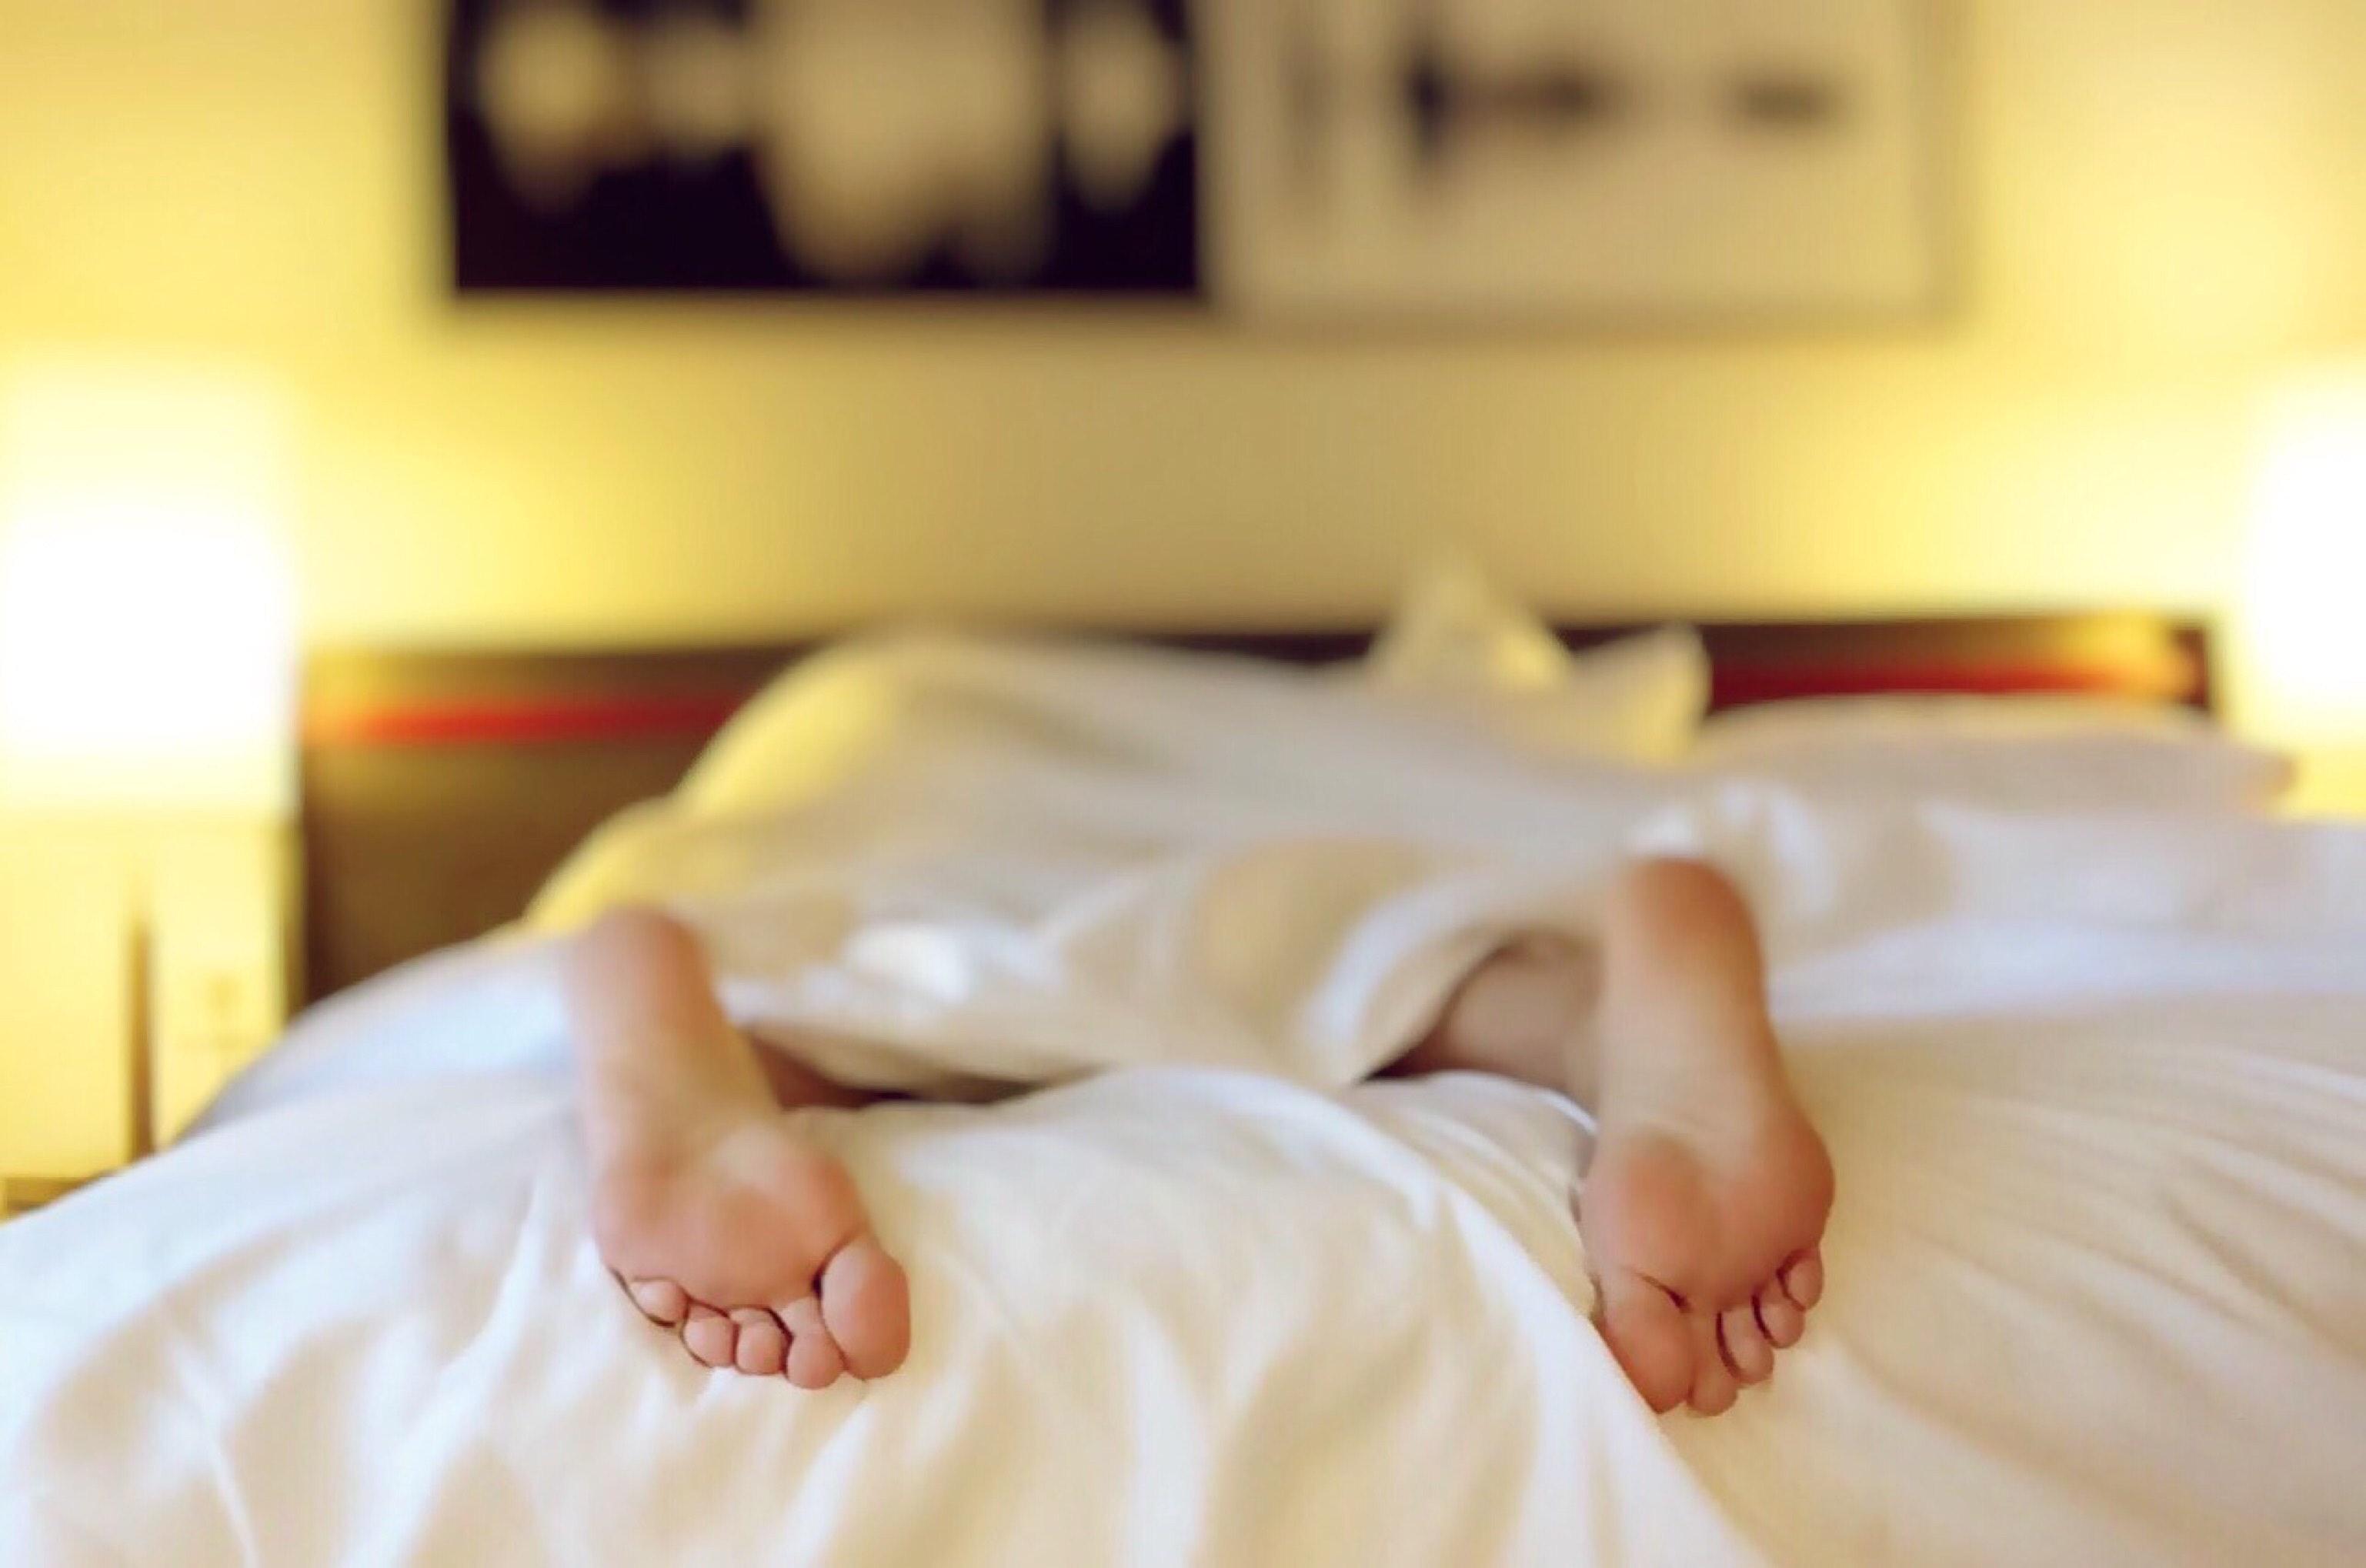 Discover This Simple Test to Diagnose Sleep Apnoea